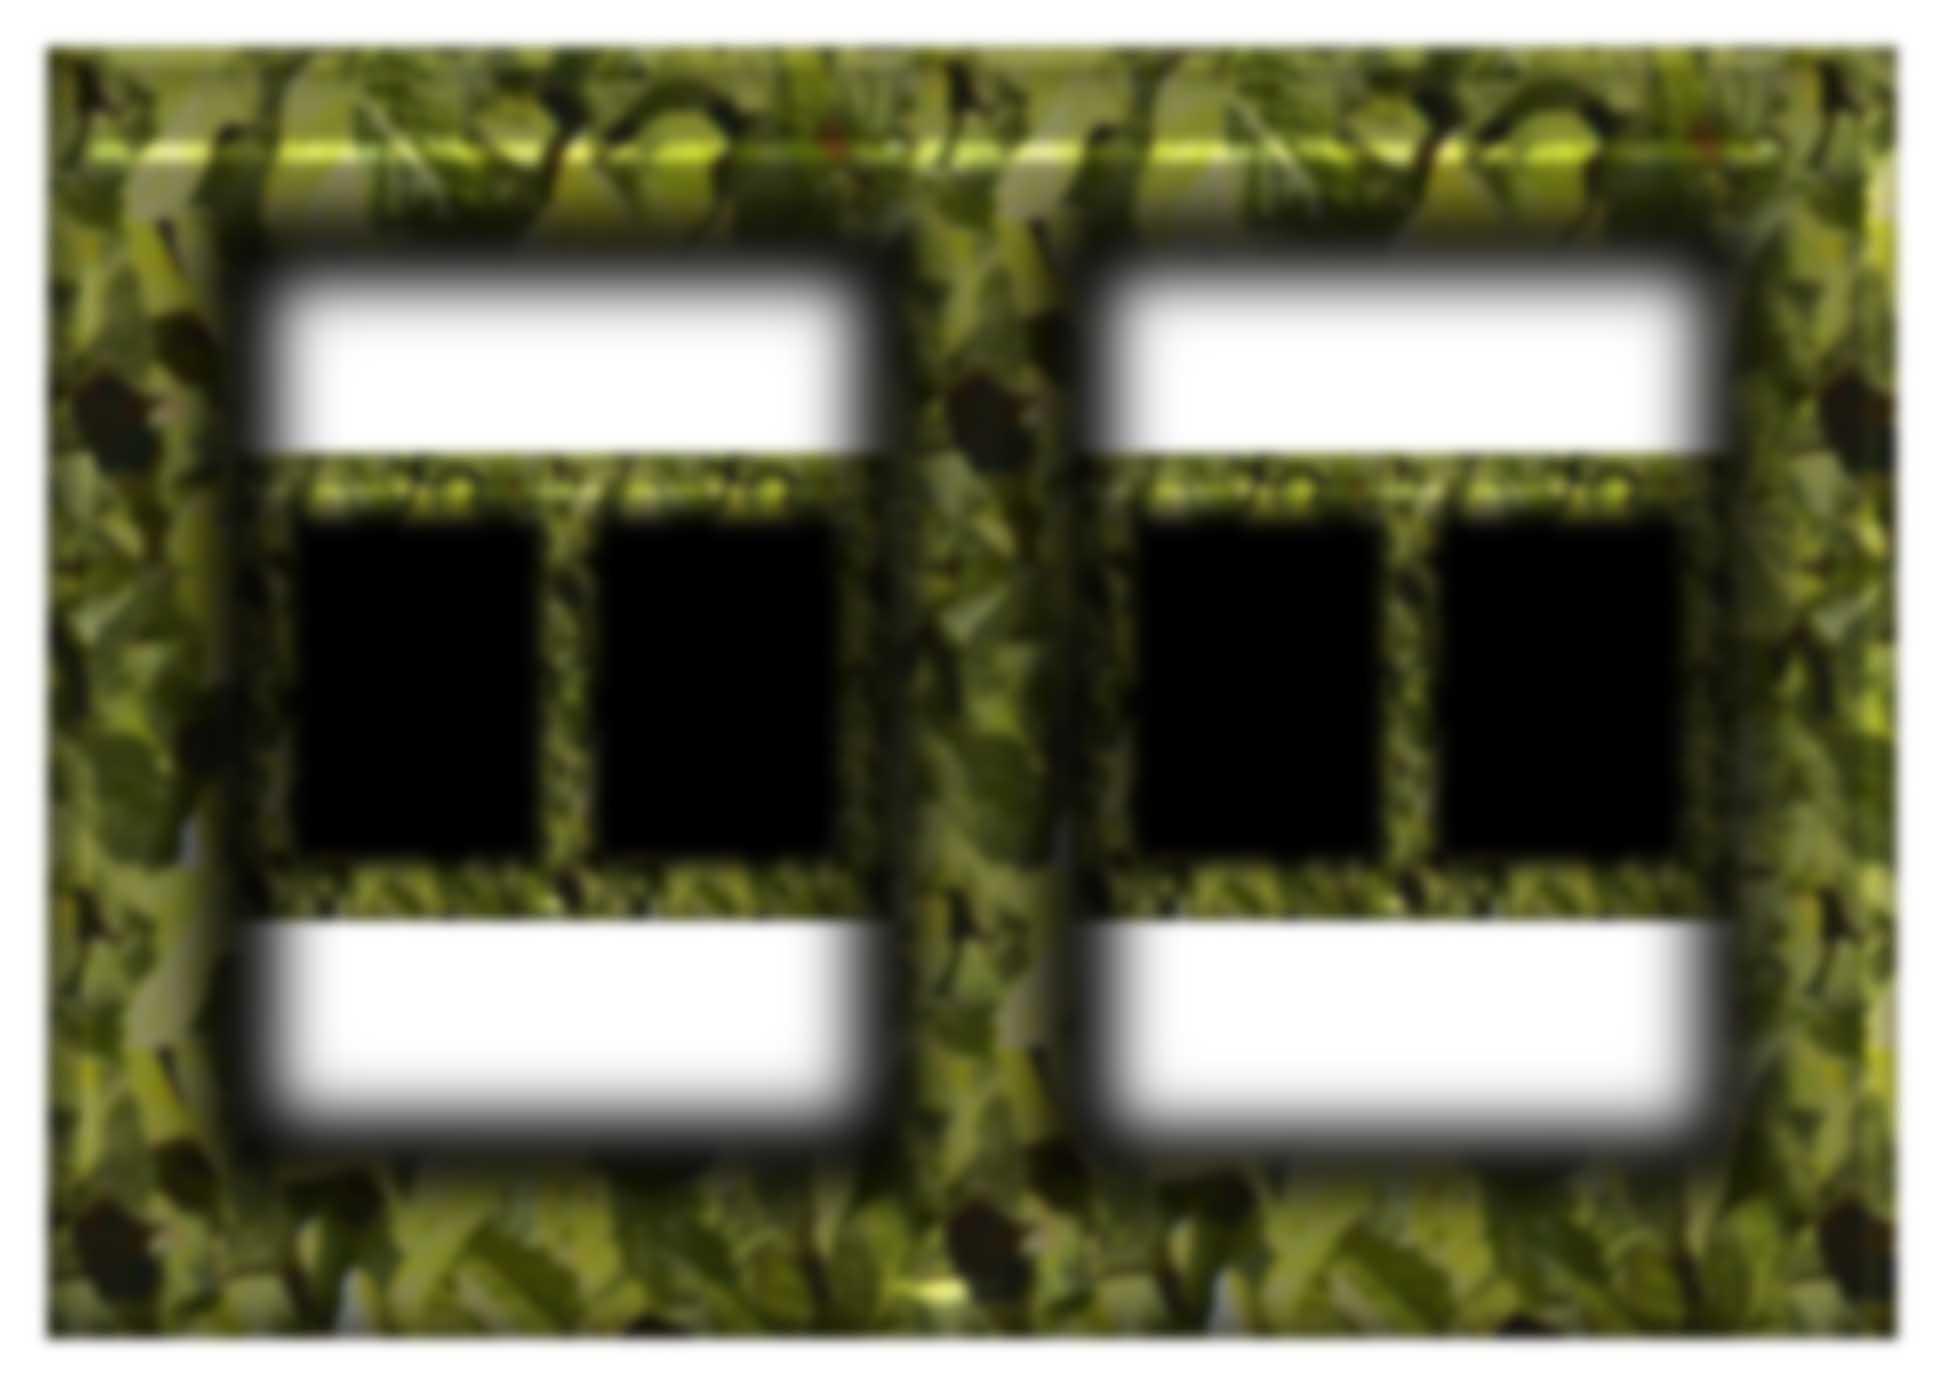 frame configuration black windows